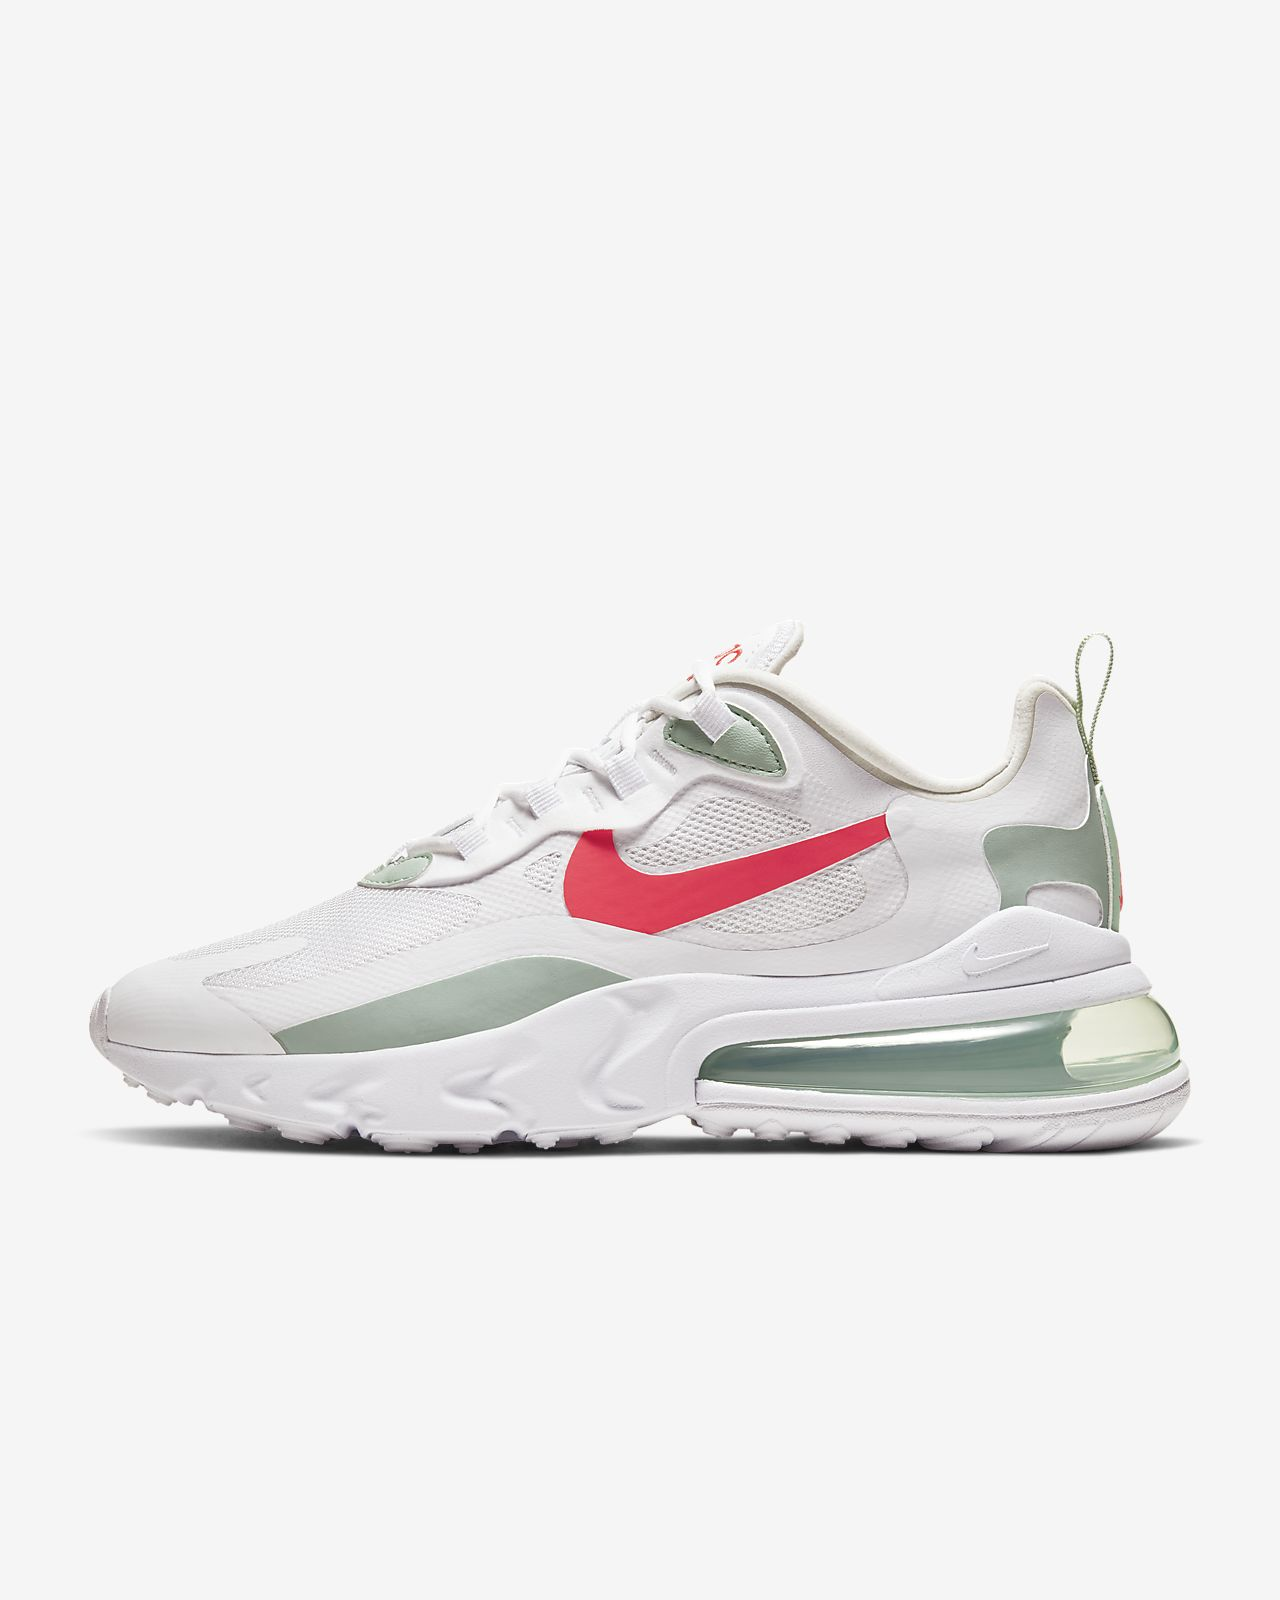 Nike Air Max 270 | Sneakerjagers | Alle kleuren, alle maten